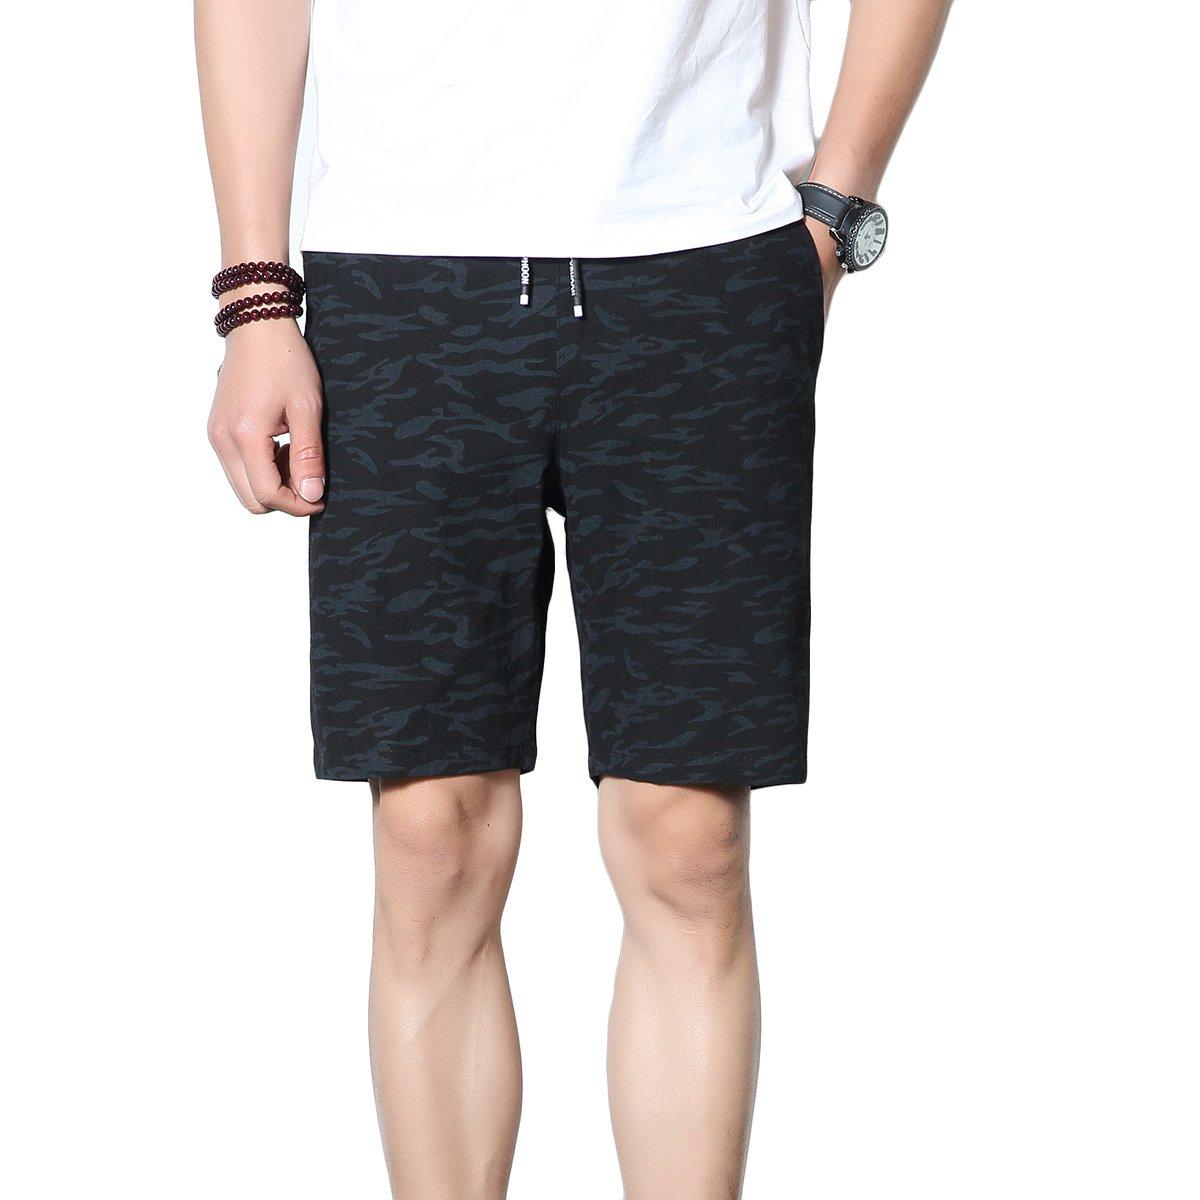 KaiDi Men's Summer Board Shorts Quick Dry Beach Shorts Swim Trunks with Pockets (XS, 2# Black) by KaiDi (Image #1)